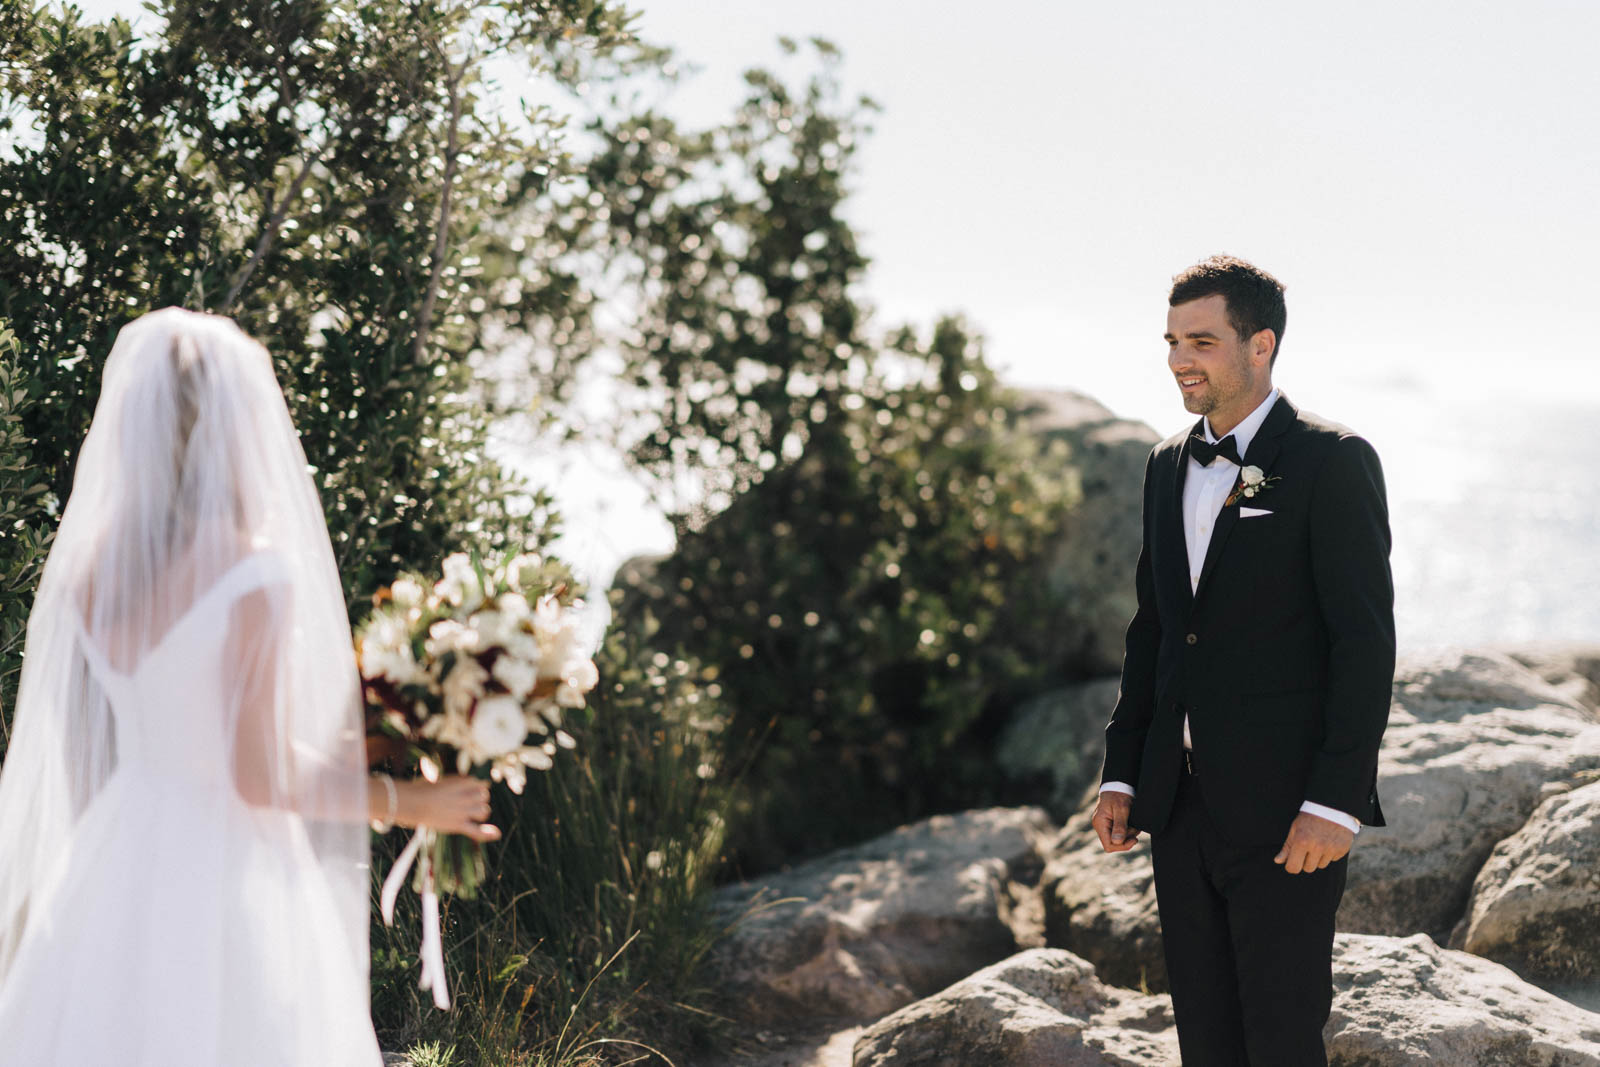 newfound-s-p-mt-maunganui-tauranga-wedding-photographer-1454-A9_04758